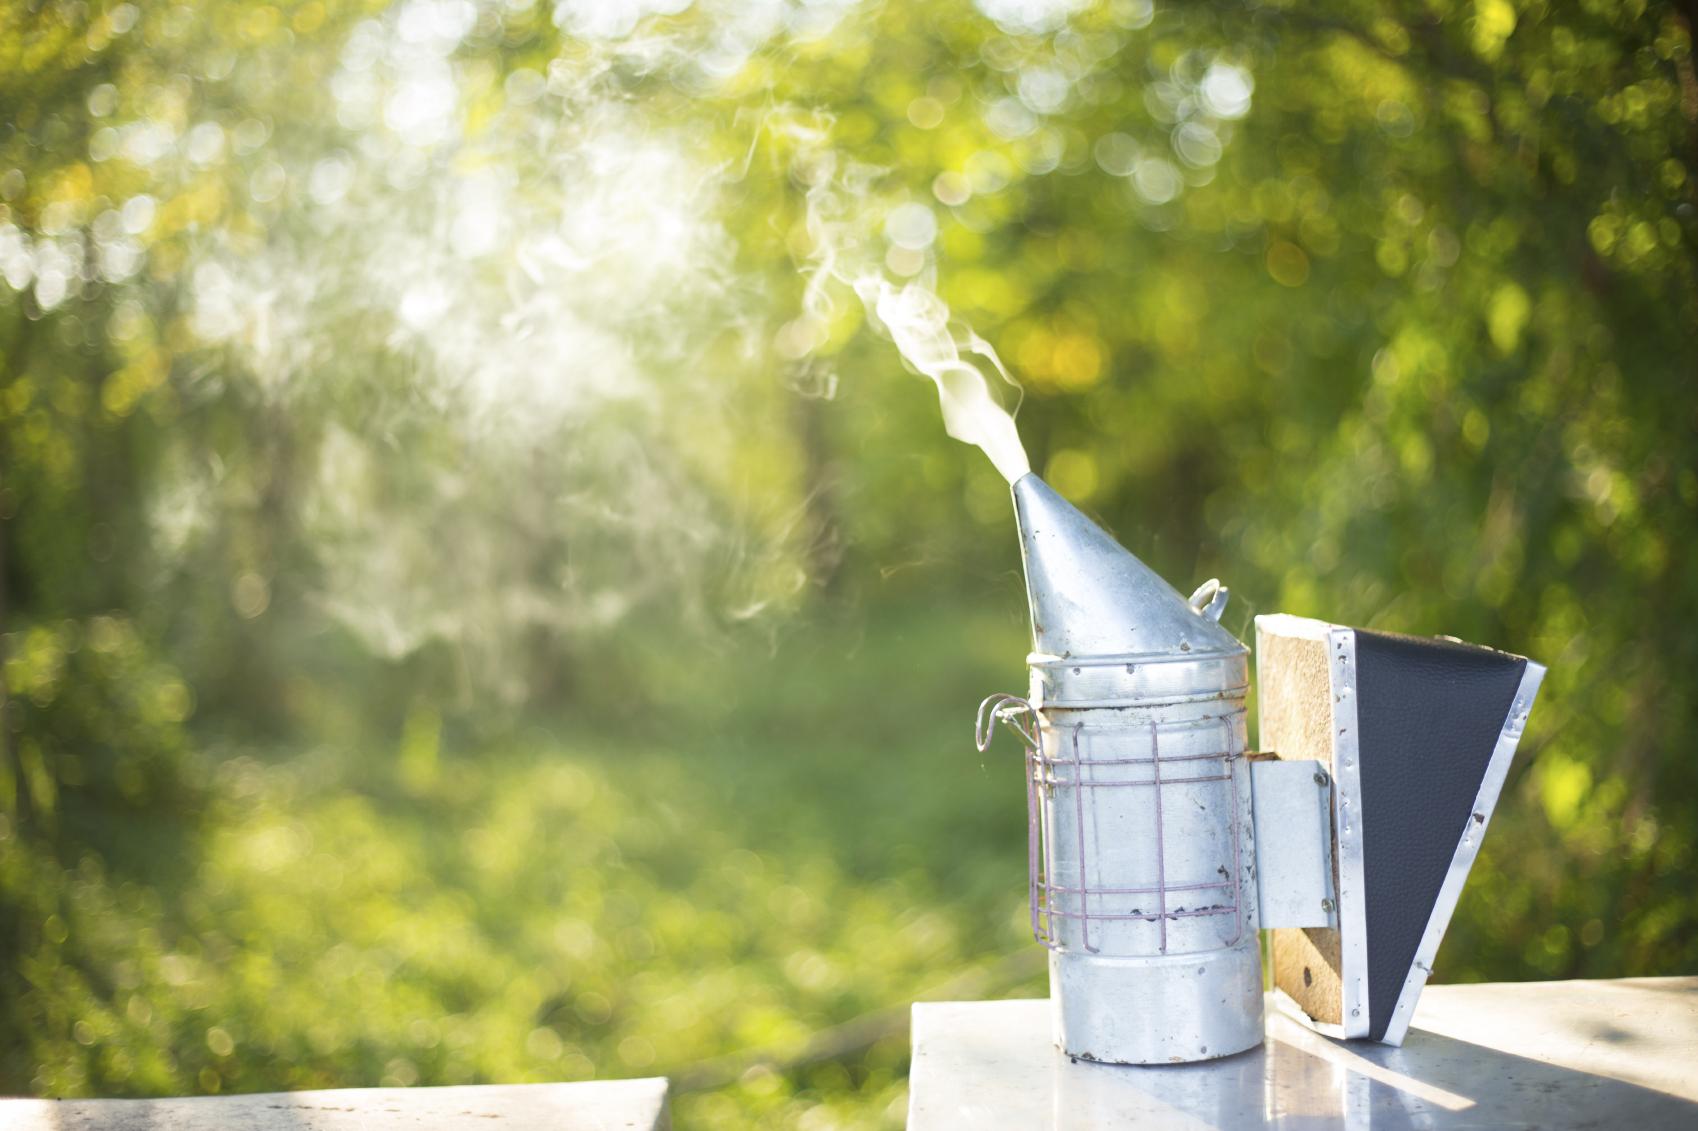 What Does a Bee Smoker Do? | Blain's Farm & Fleet Blog